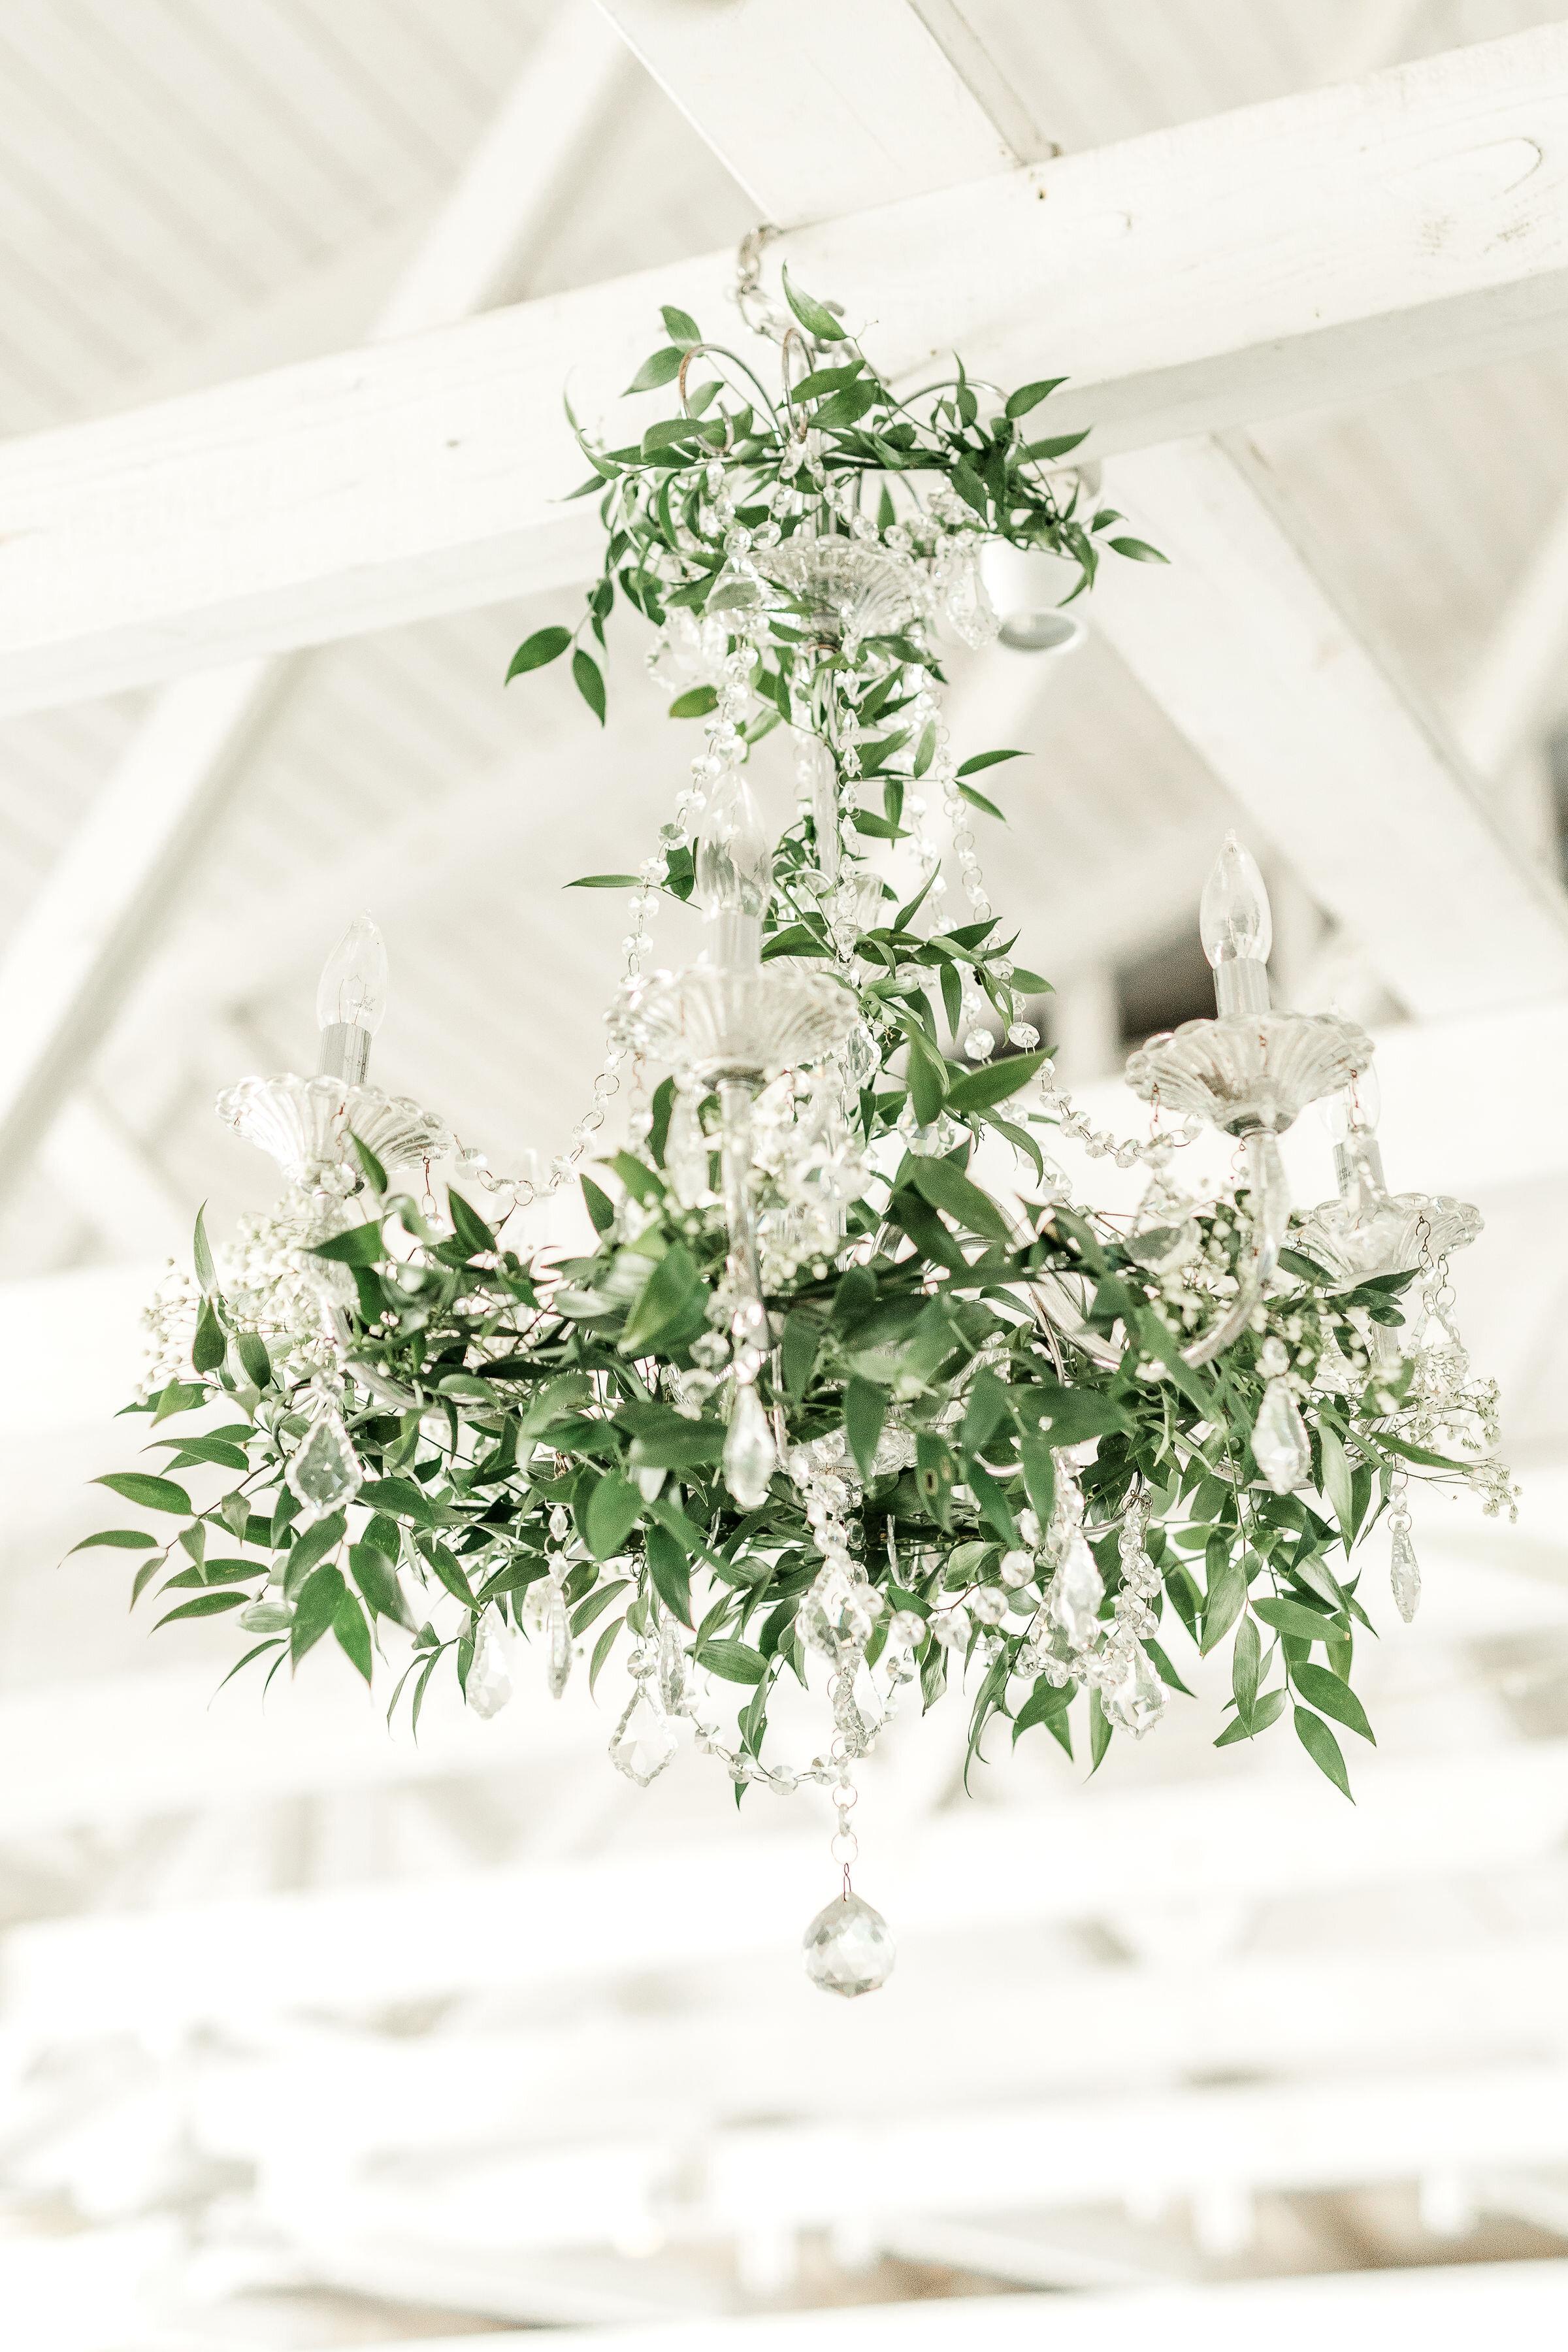 greenery-chandiler-hanging-greenry-classic-detail-hanging-floral-green-southern-wedding-mackey-house.jpg